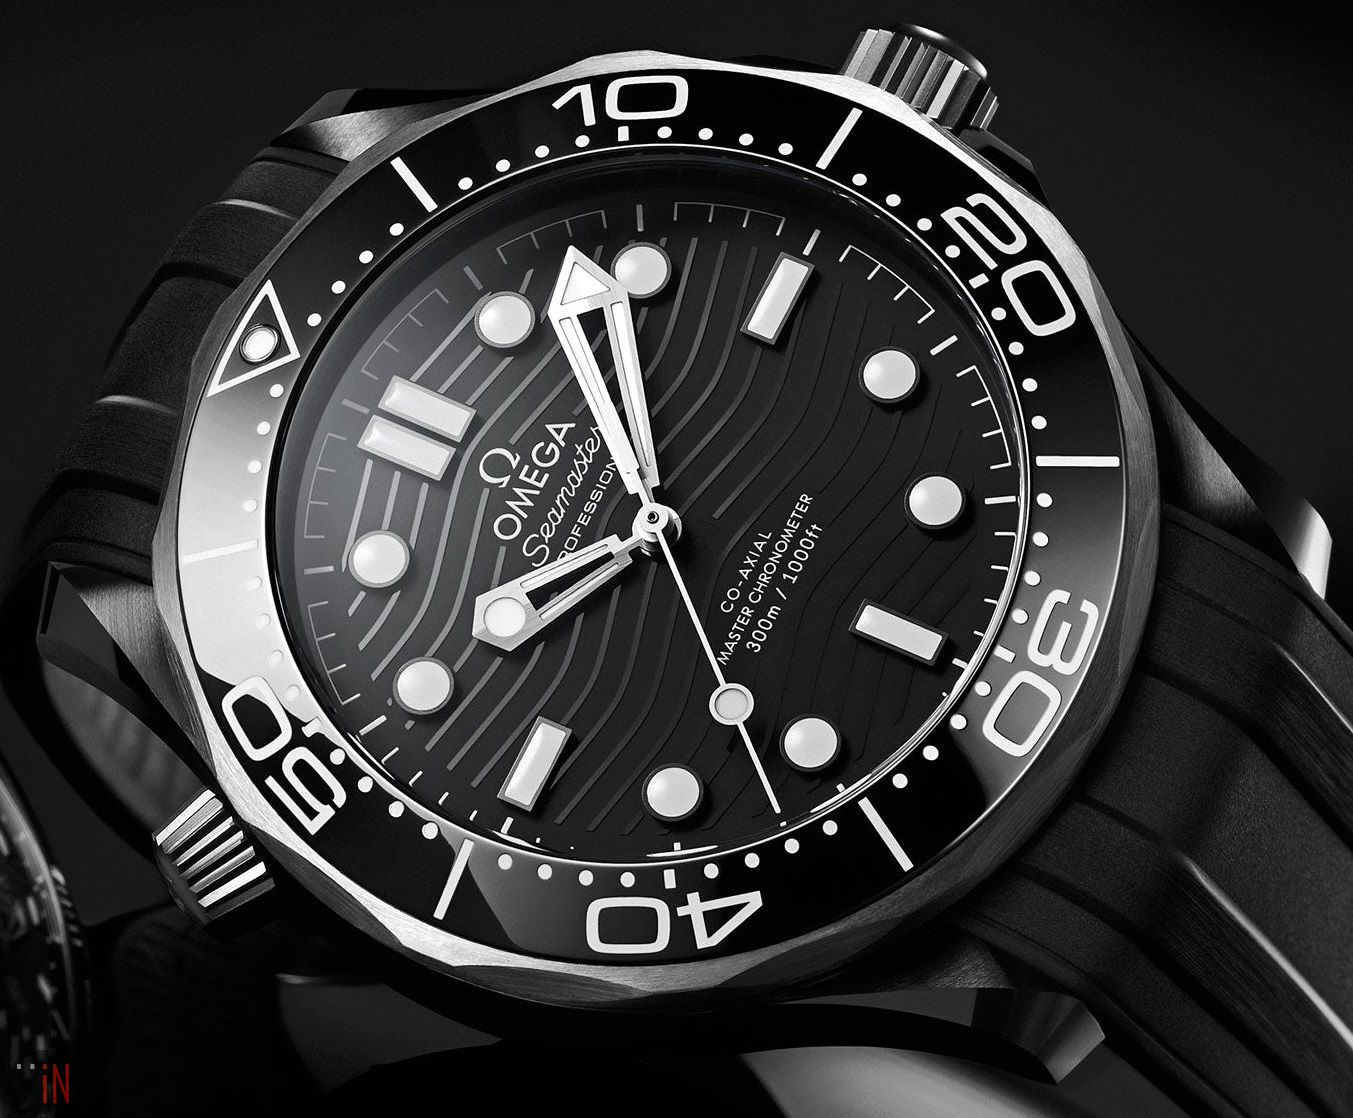 Omega Seamaster Diver 300M Black Ceramic and Titanium | Omega seamaster  diver 300m, Omega seamaster diver, Omega seamaster